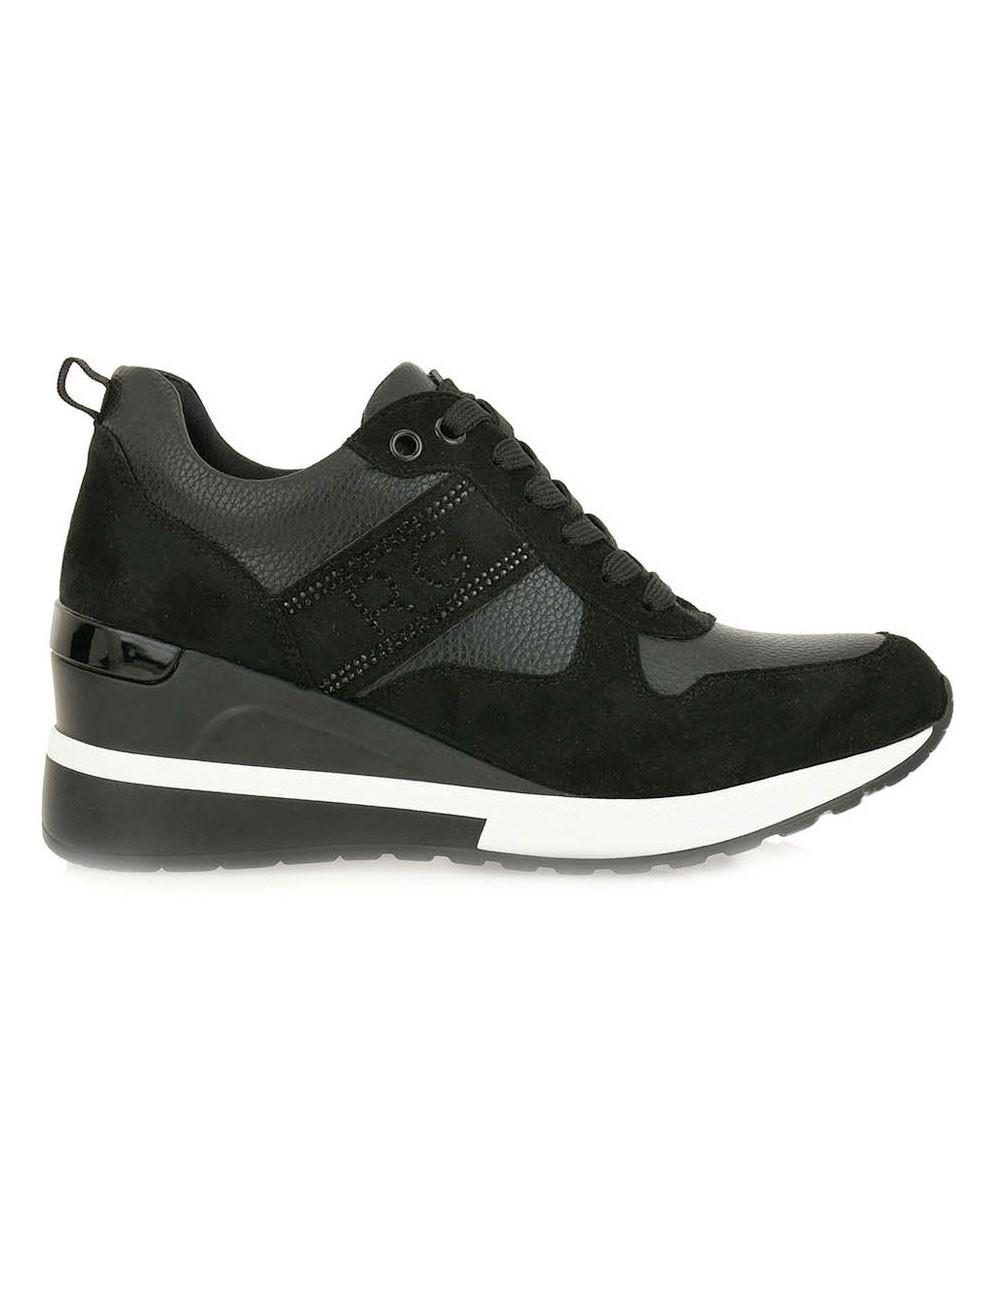 Renato Garini Γυναικεία Παπούτσια Sneakers 340-19R Μαύρο Kαστόρι N119R340308R